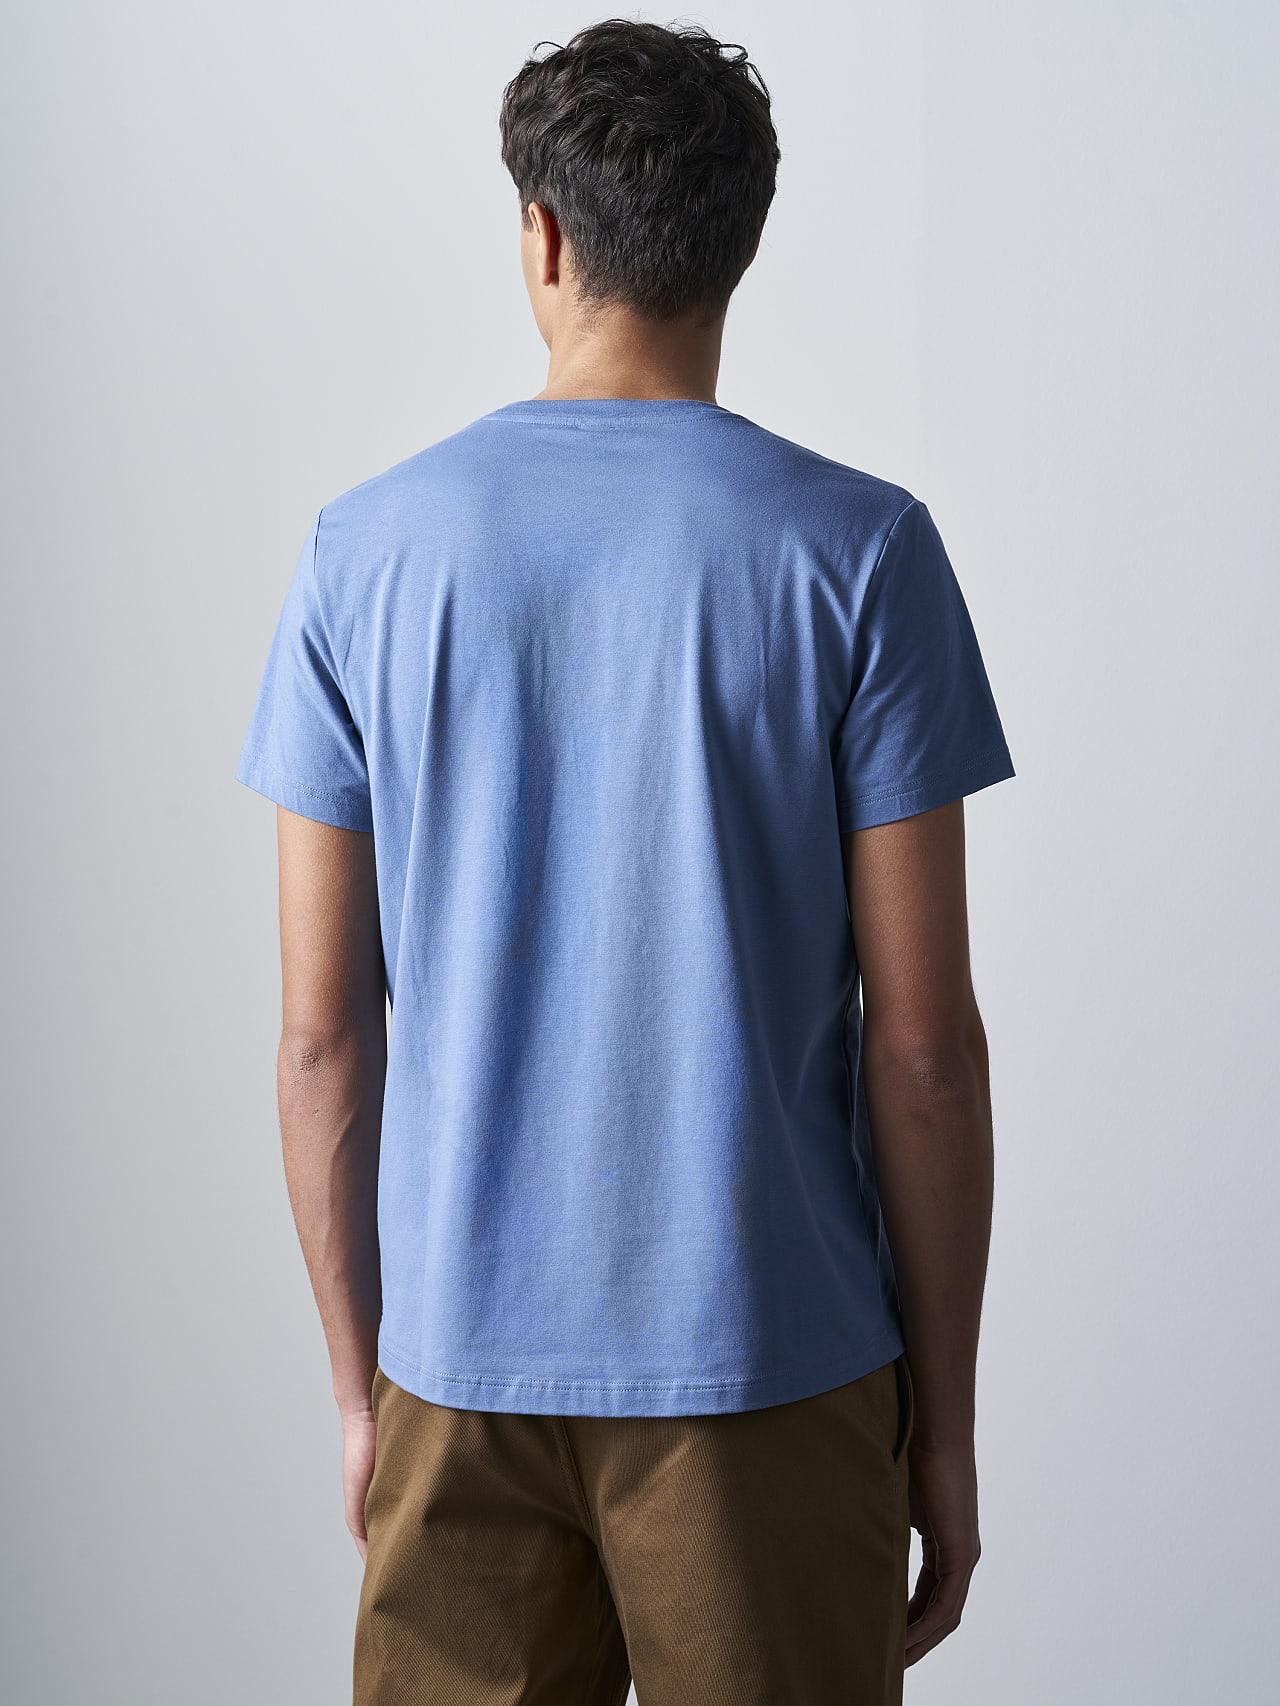 JABIS V1.Y5.02 Logo Print T-Shirt light blue Front Main Alpha Tauri